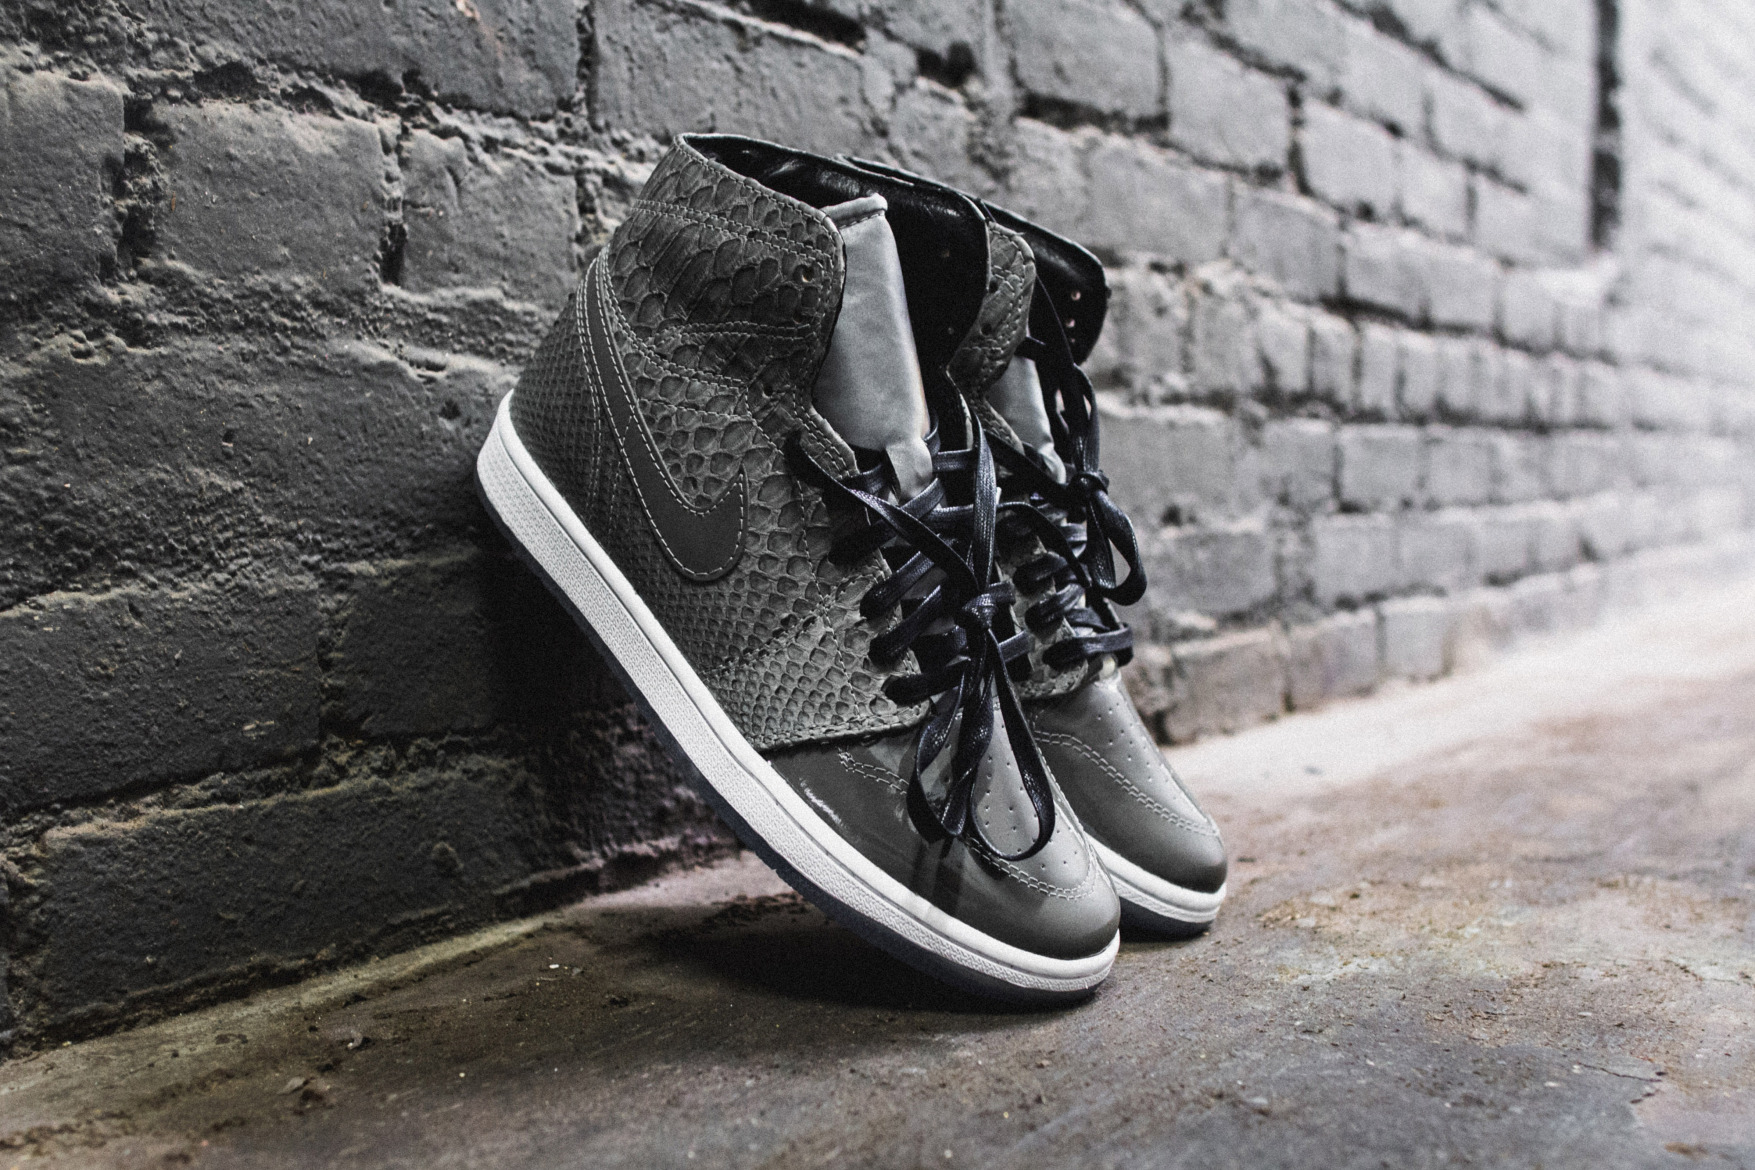 the-shoe-surgeon-custom-air-jordan-1-python-patent-leather-3m-2.jpg